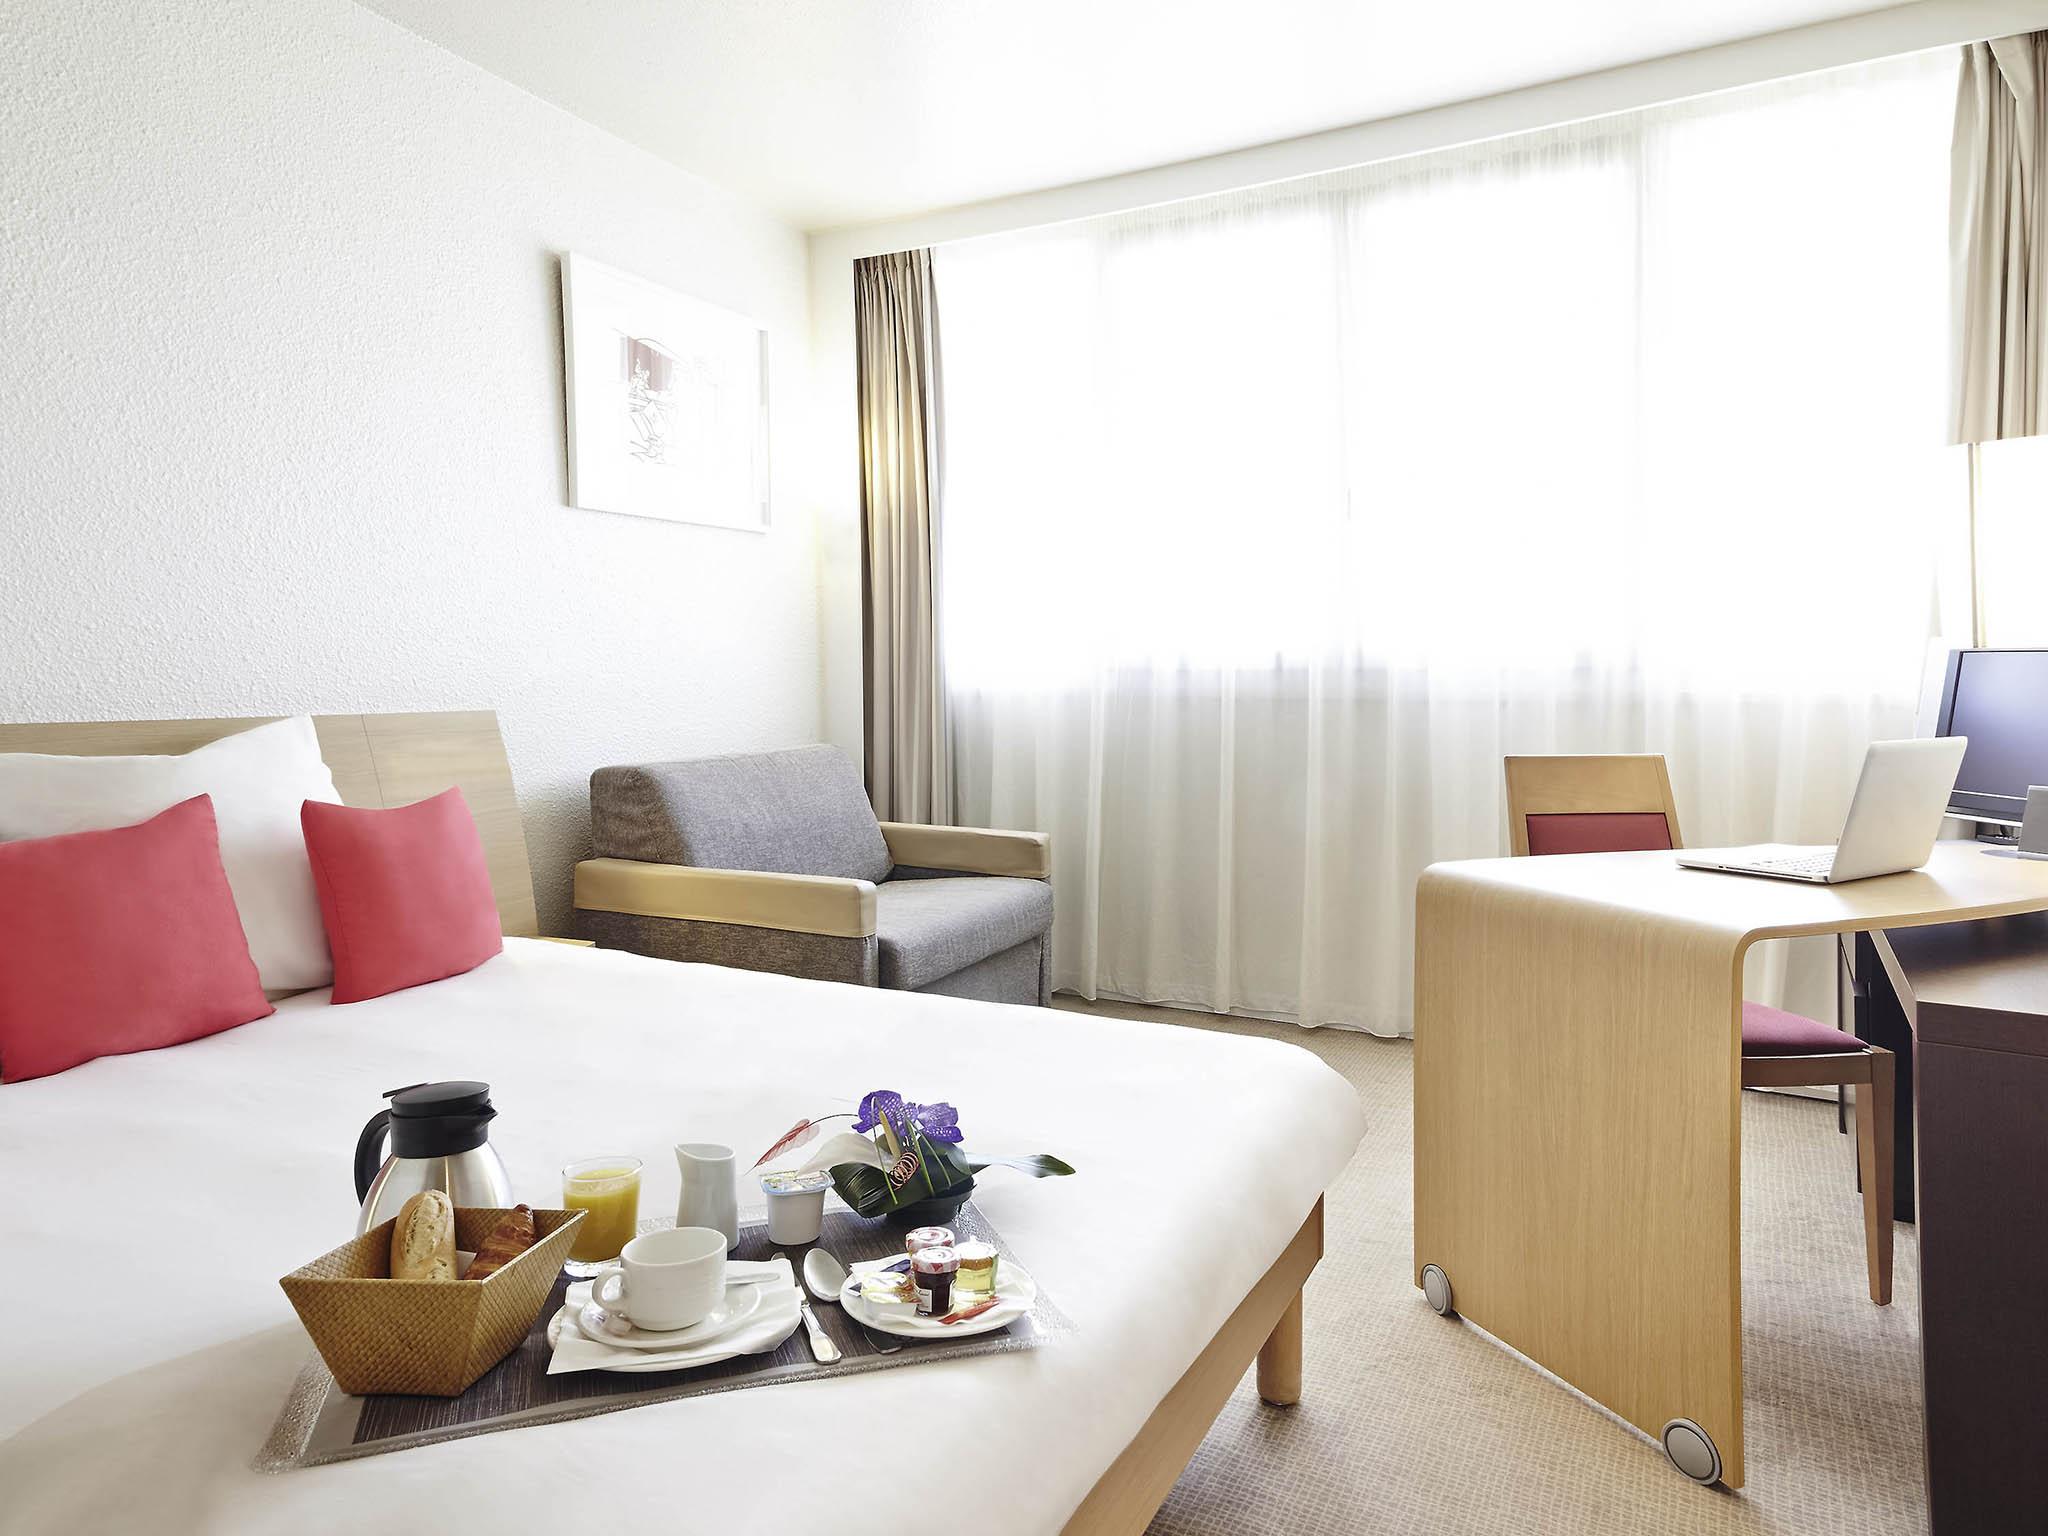 Novotel London Heathrow | Relaxing Hotel in Heathrow